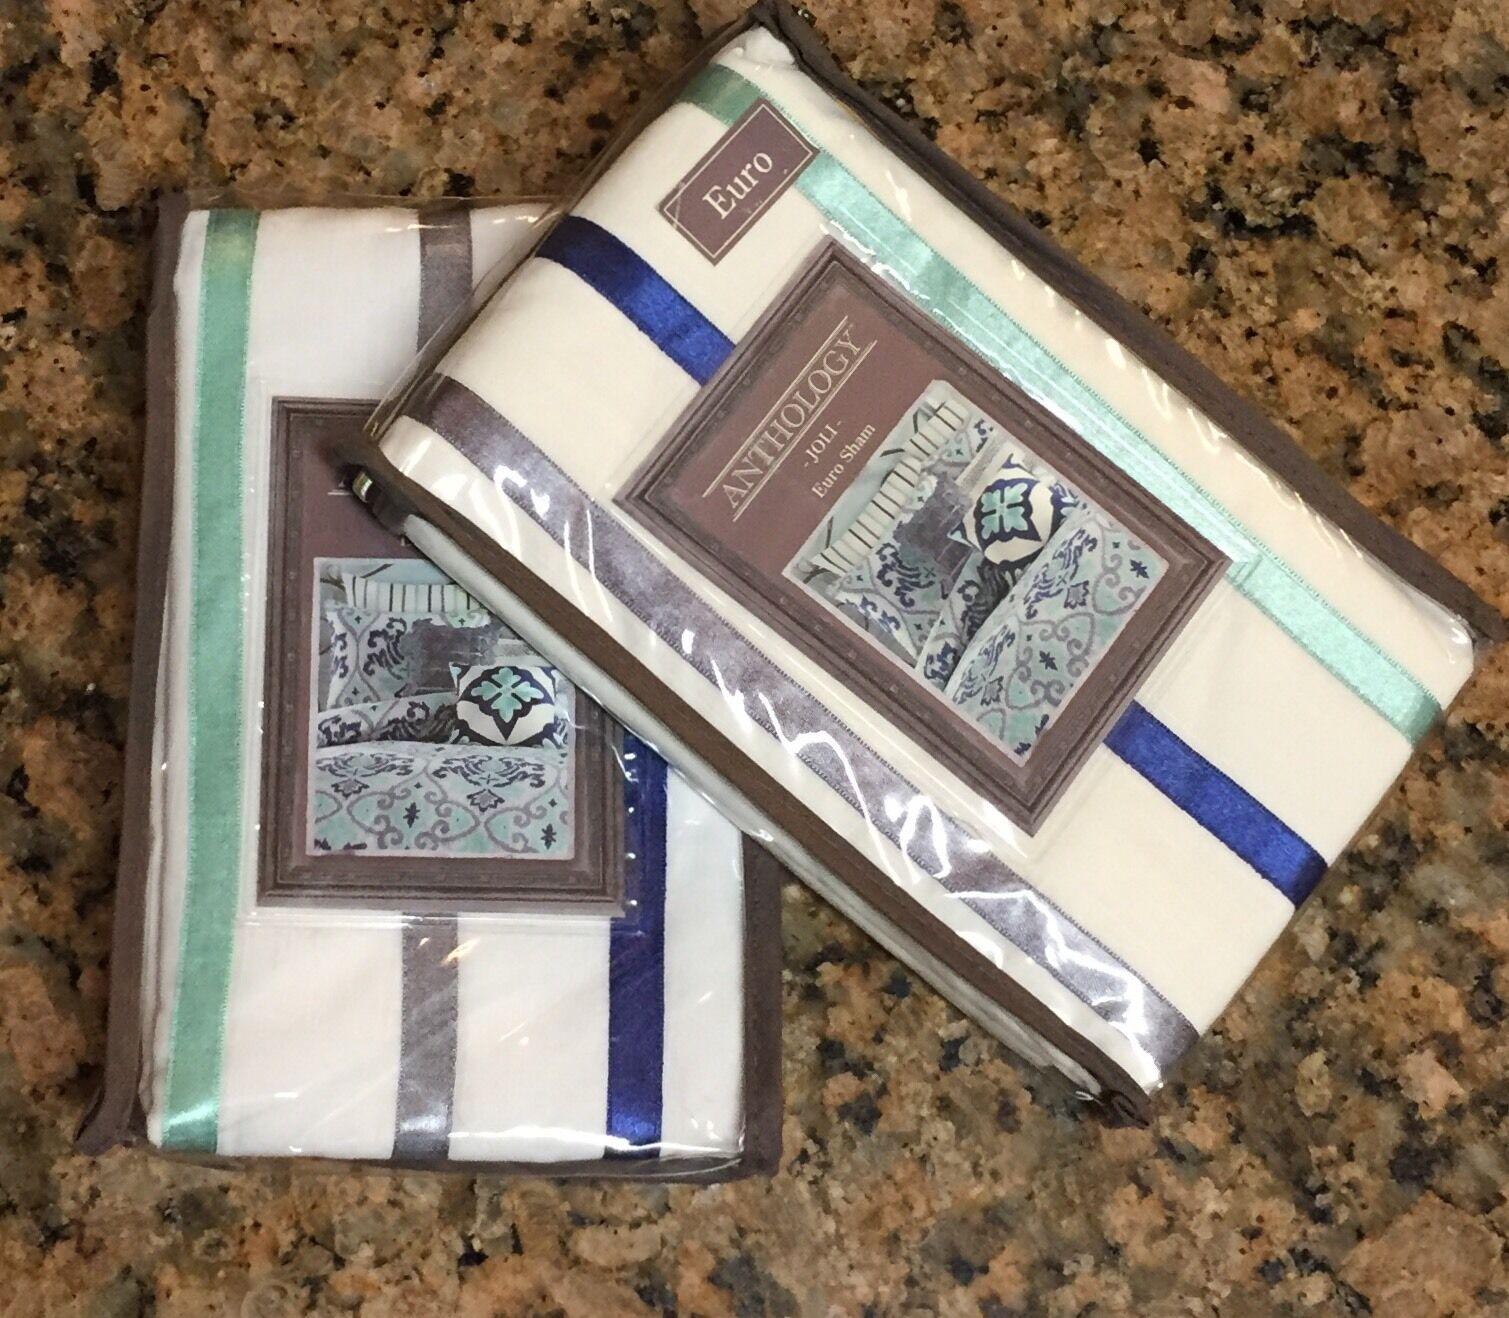 (2) Anthology Jolie Euro Shams bianca blu Aqua Embroiderosso Ribbon Stripes